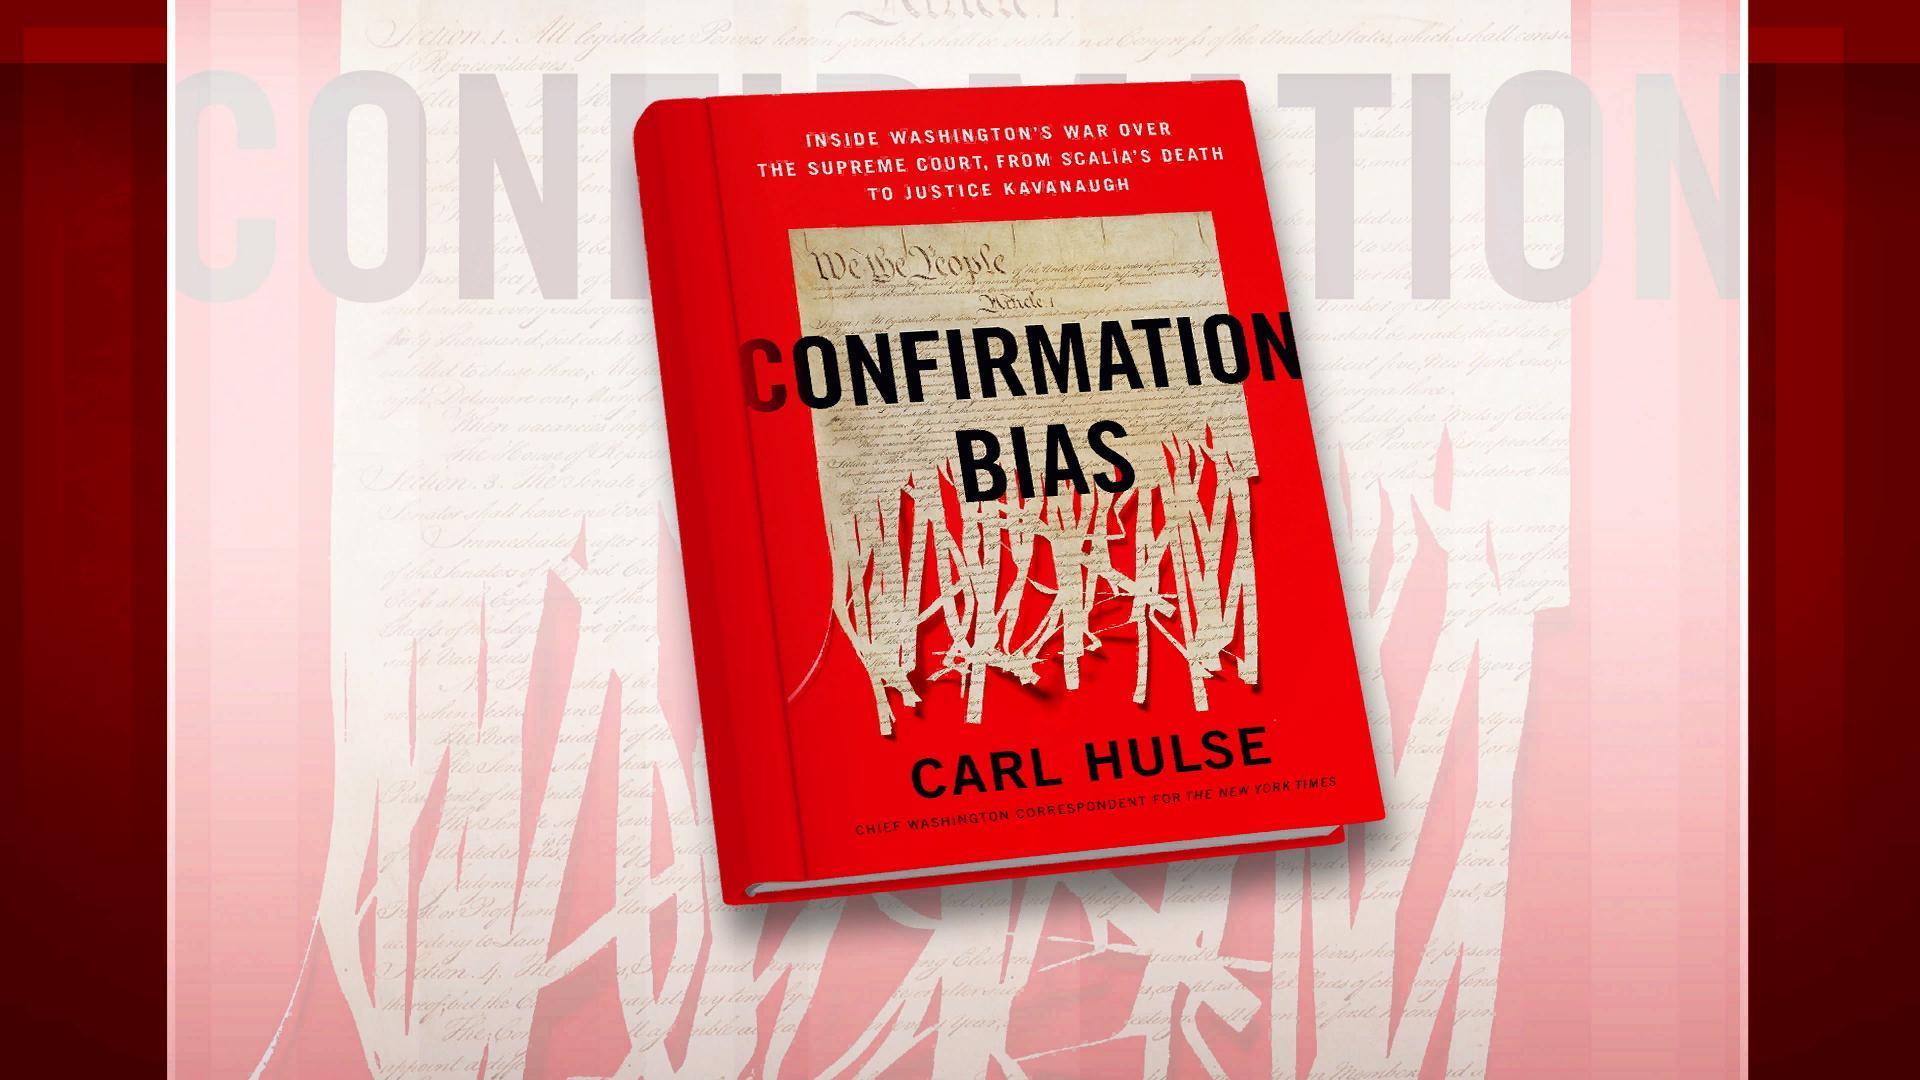 'Confirmation Bias' looks at partisanship and SCOTUS